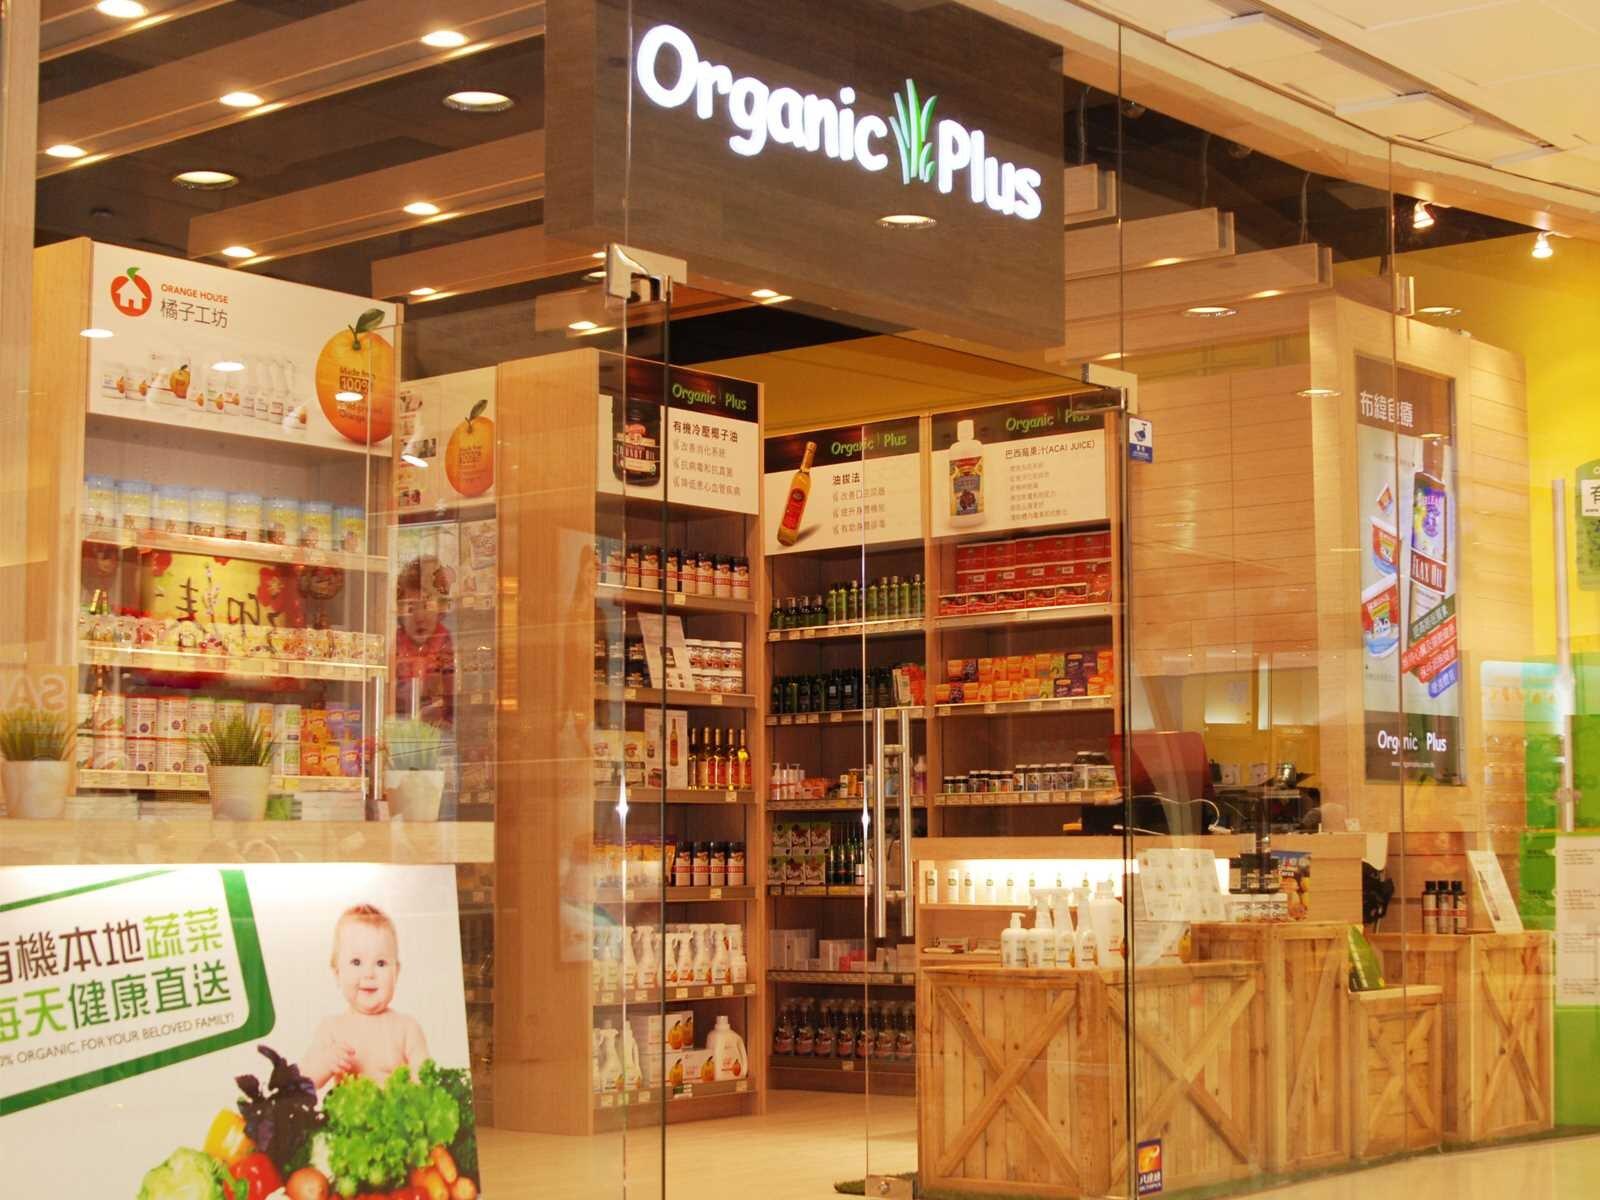 Organic Plus   East Point City Shop  Business Hours:10:30am-8:30pm Mobile:2887 6808 Email:epc@organicplus.com.hk Address:Shop No. 256, Level 2, East Point City, 8 Chung Wa Road,  Tseung Kwan O, N.T.